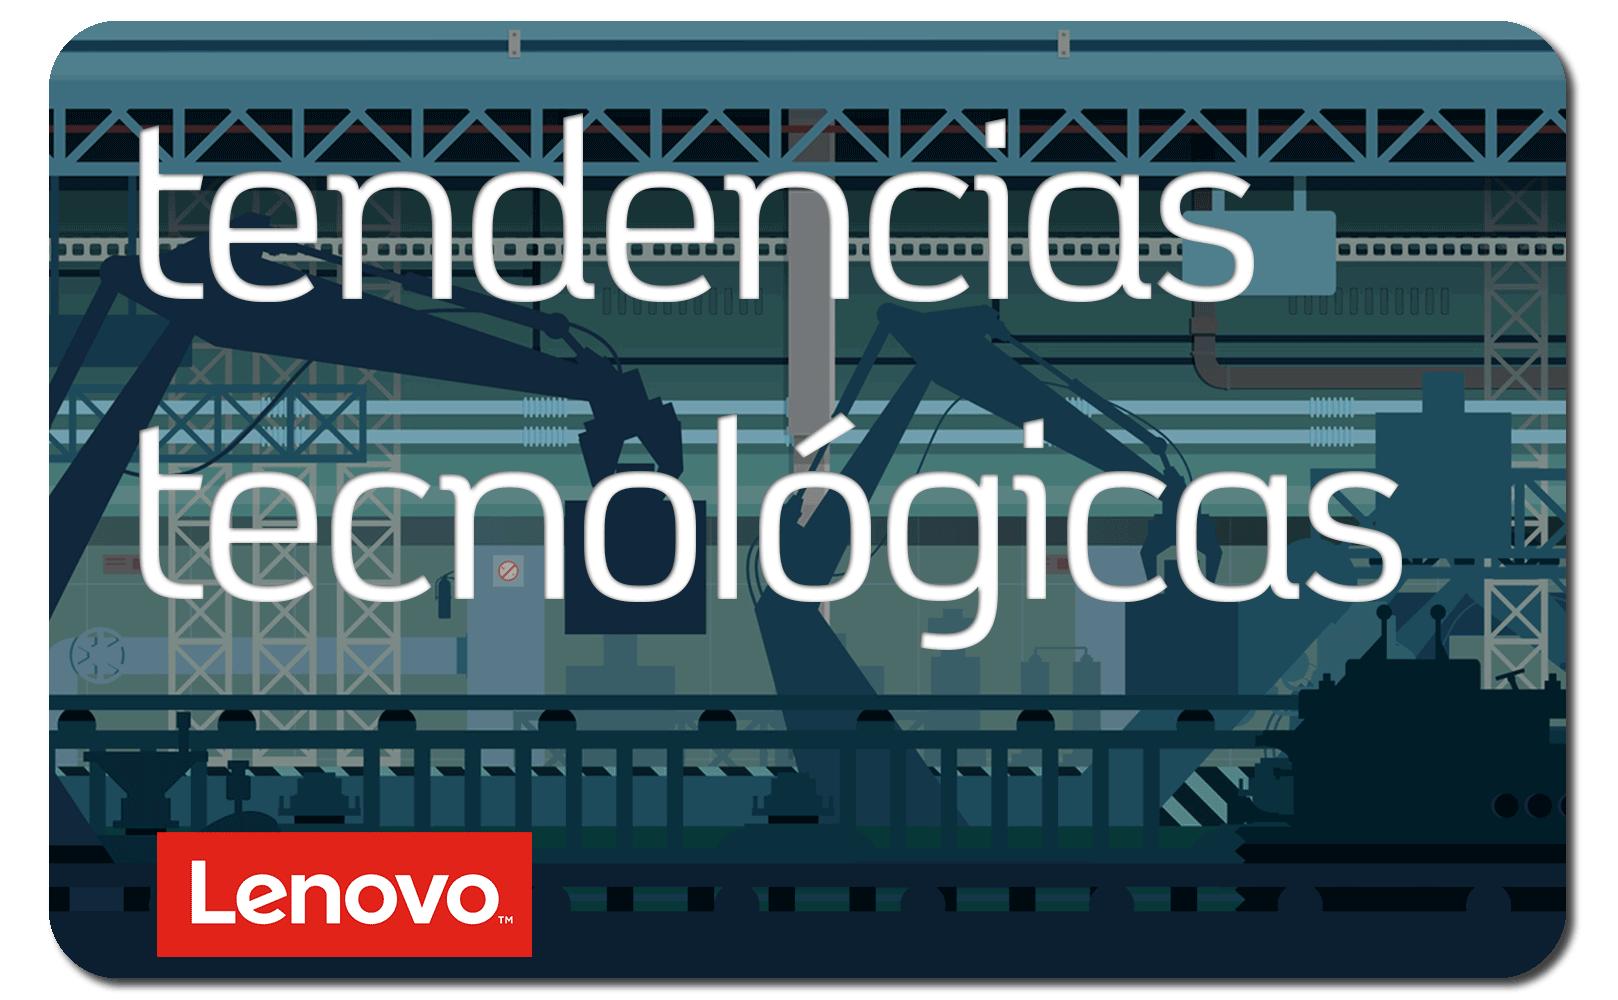 redaccion-profesional-articulos-tendencias-tecnologicas-lenovo-ensayos